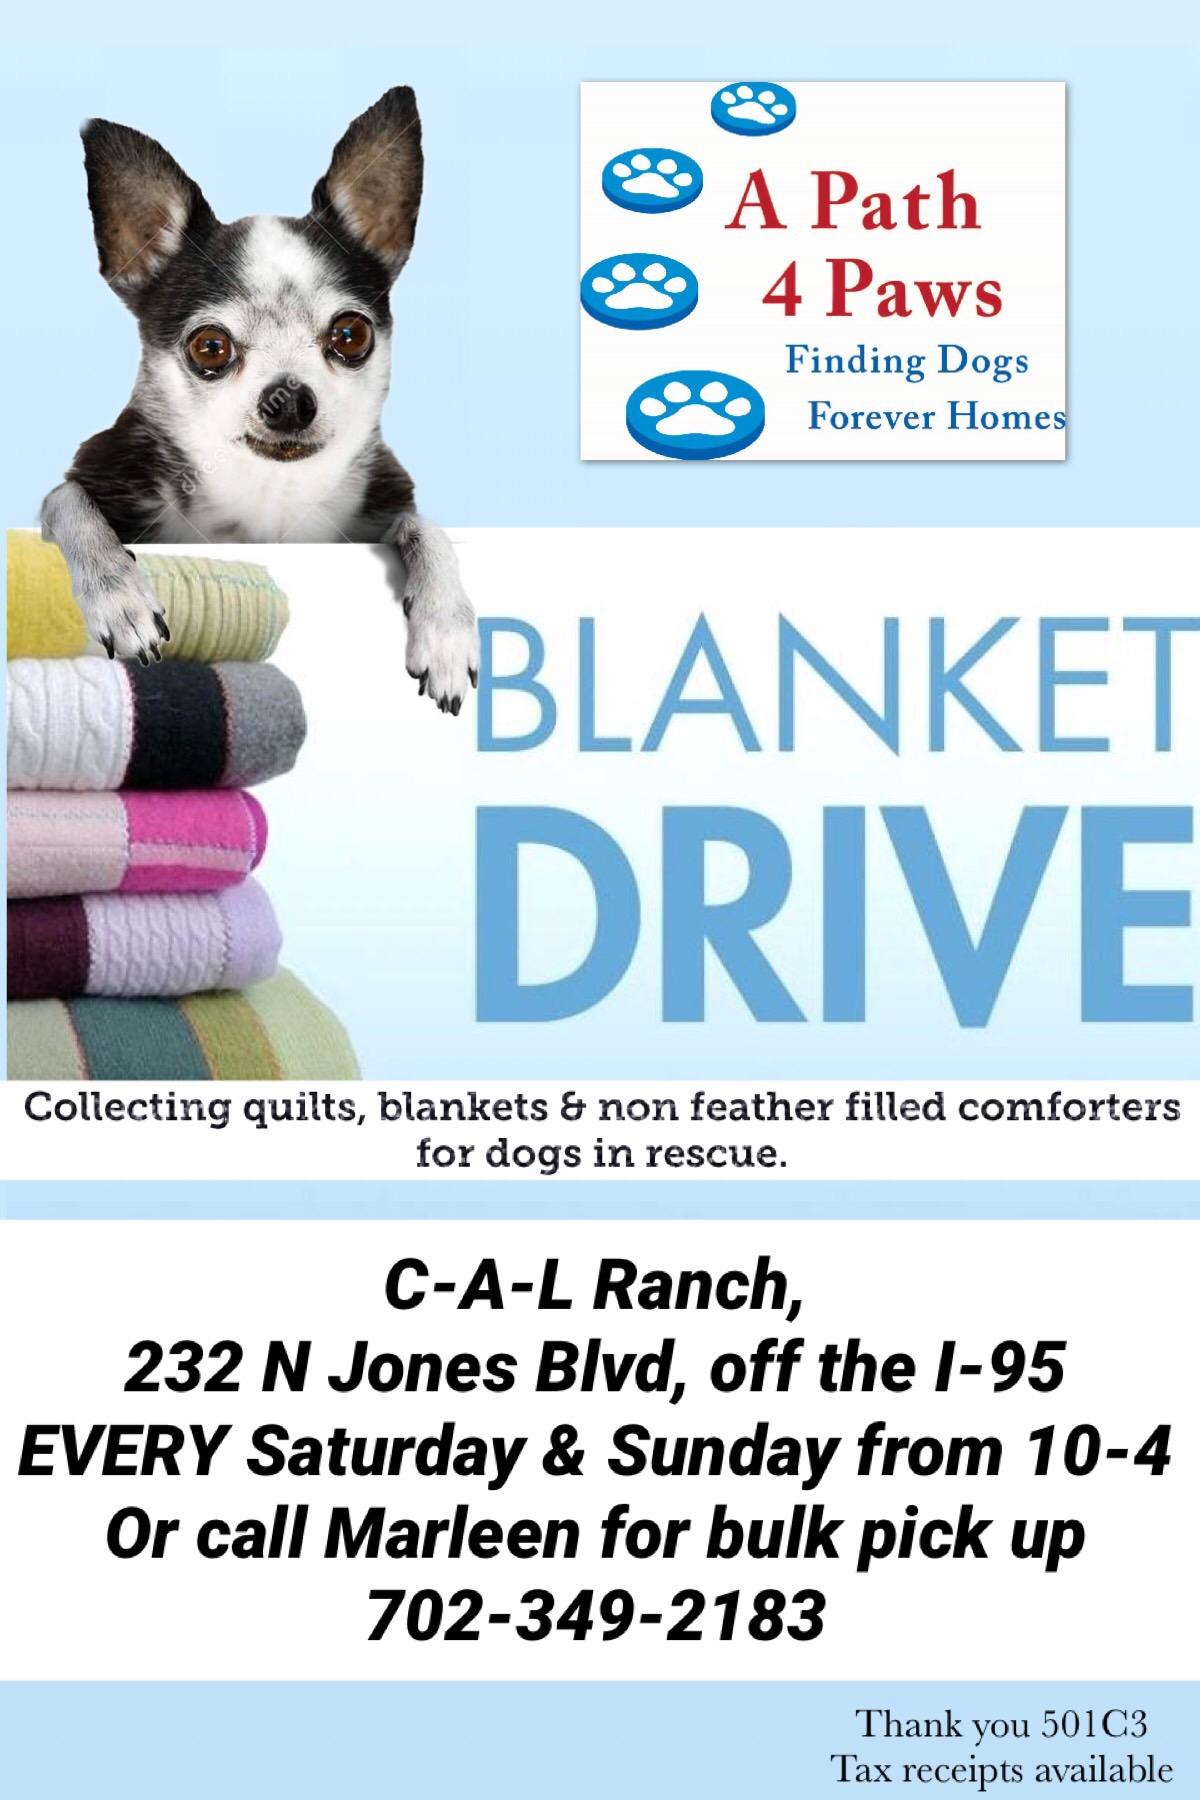 Blanket drive flyer